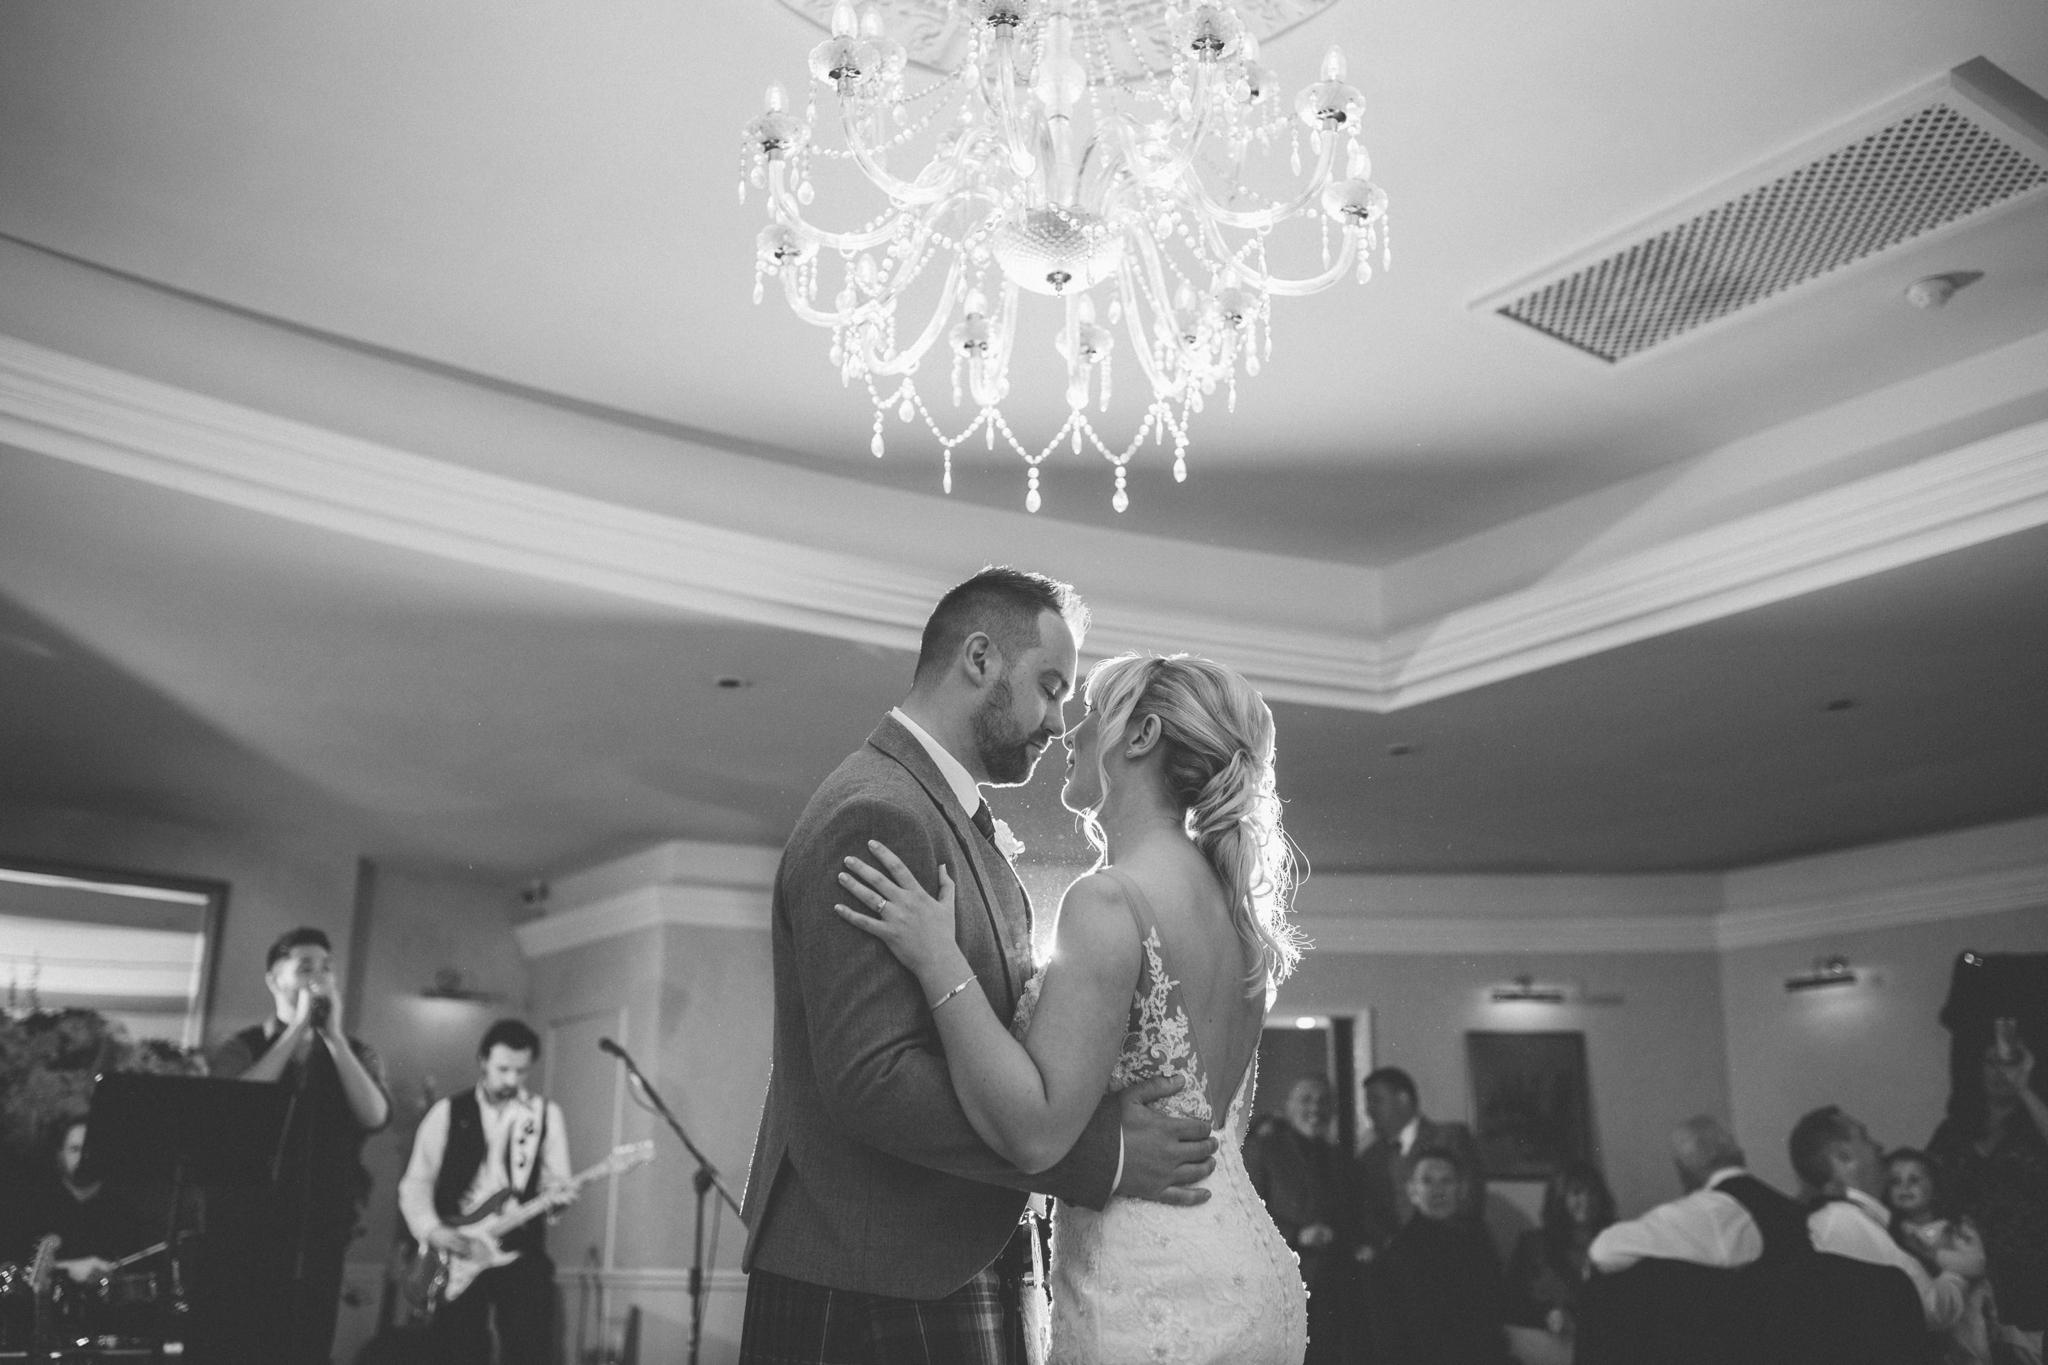 Suzanne_li_photography_Roman_camp_wedding_0042.jpg